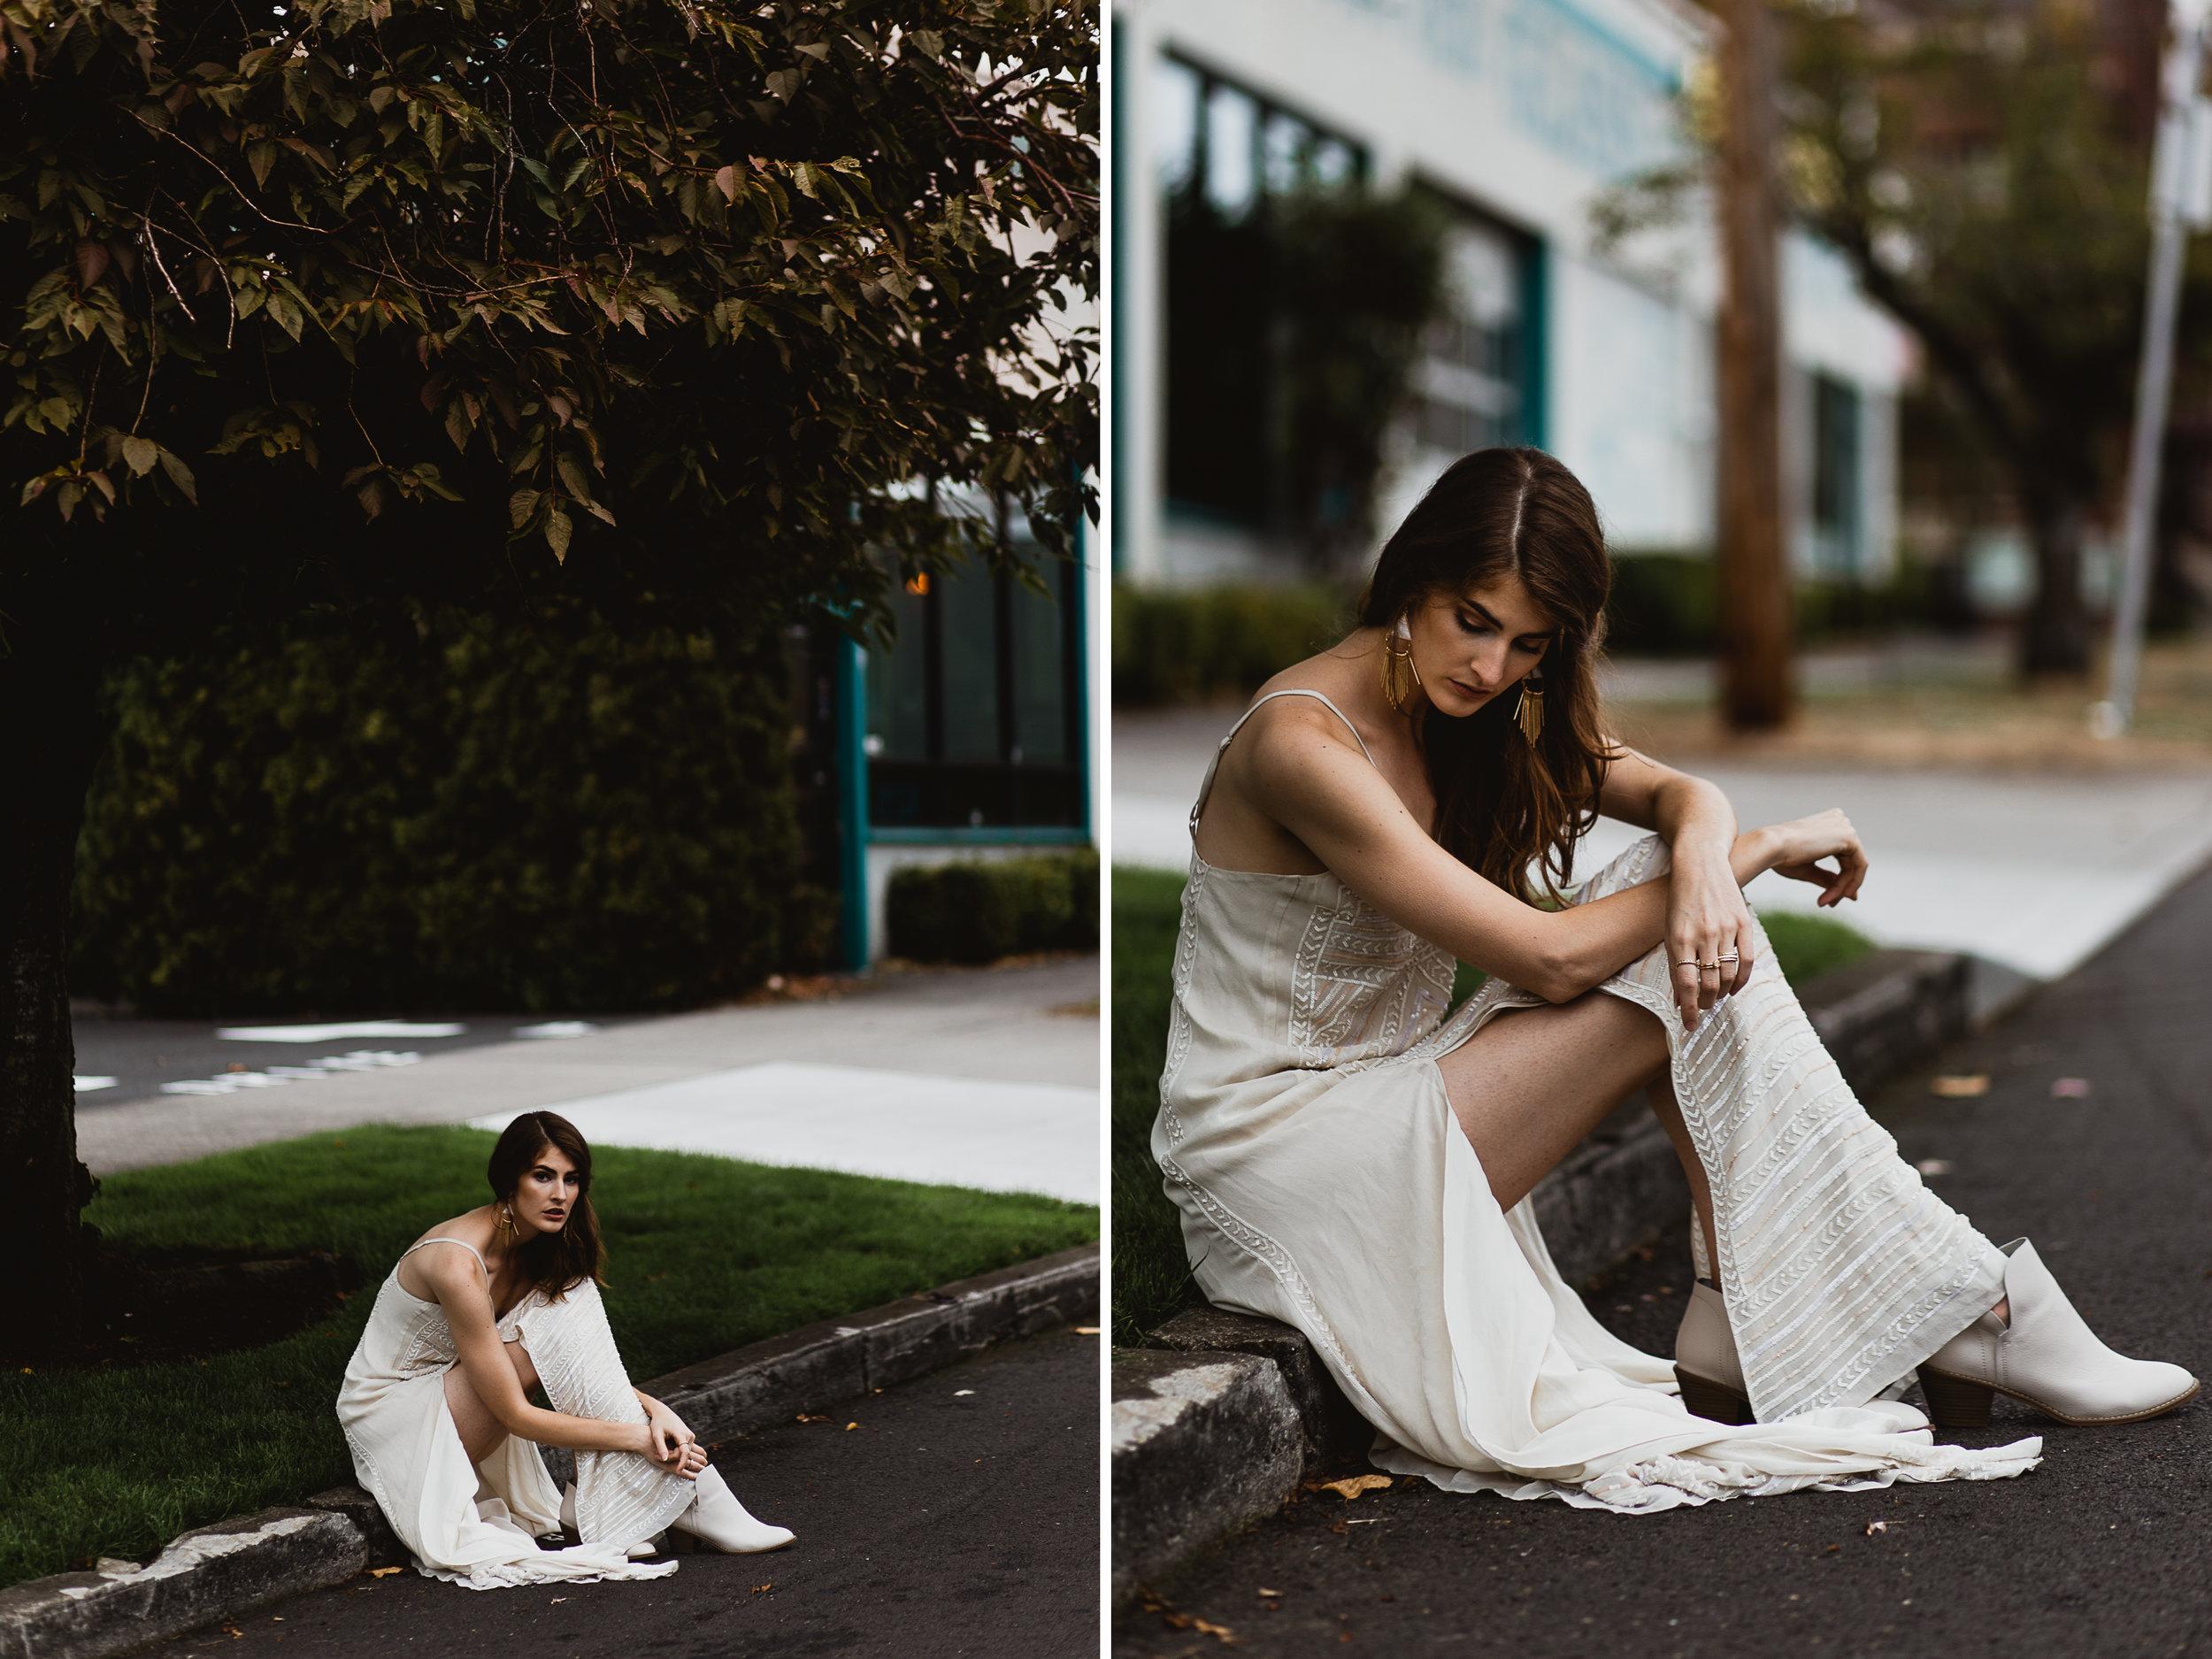 Amy - Bridal Styled Shoot - Vancouver WA - Malina Rose Photography-D92.jpg